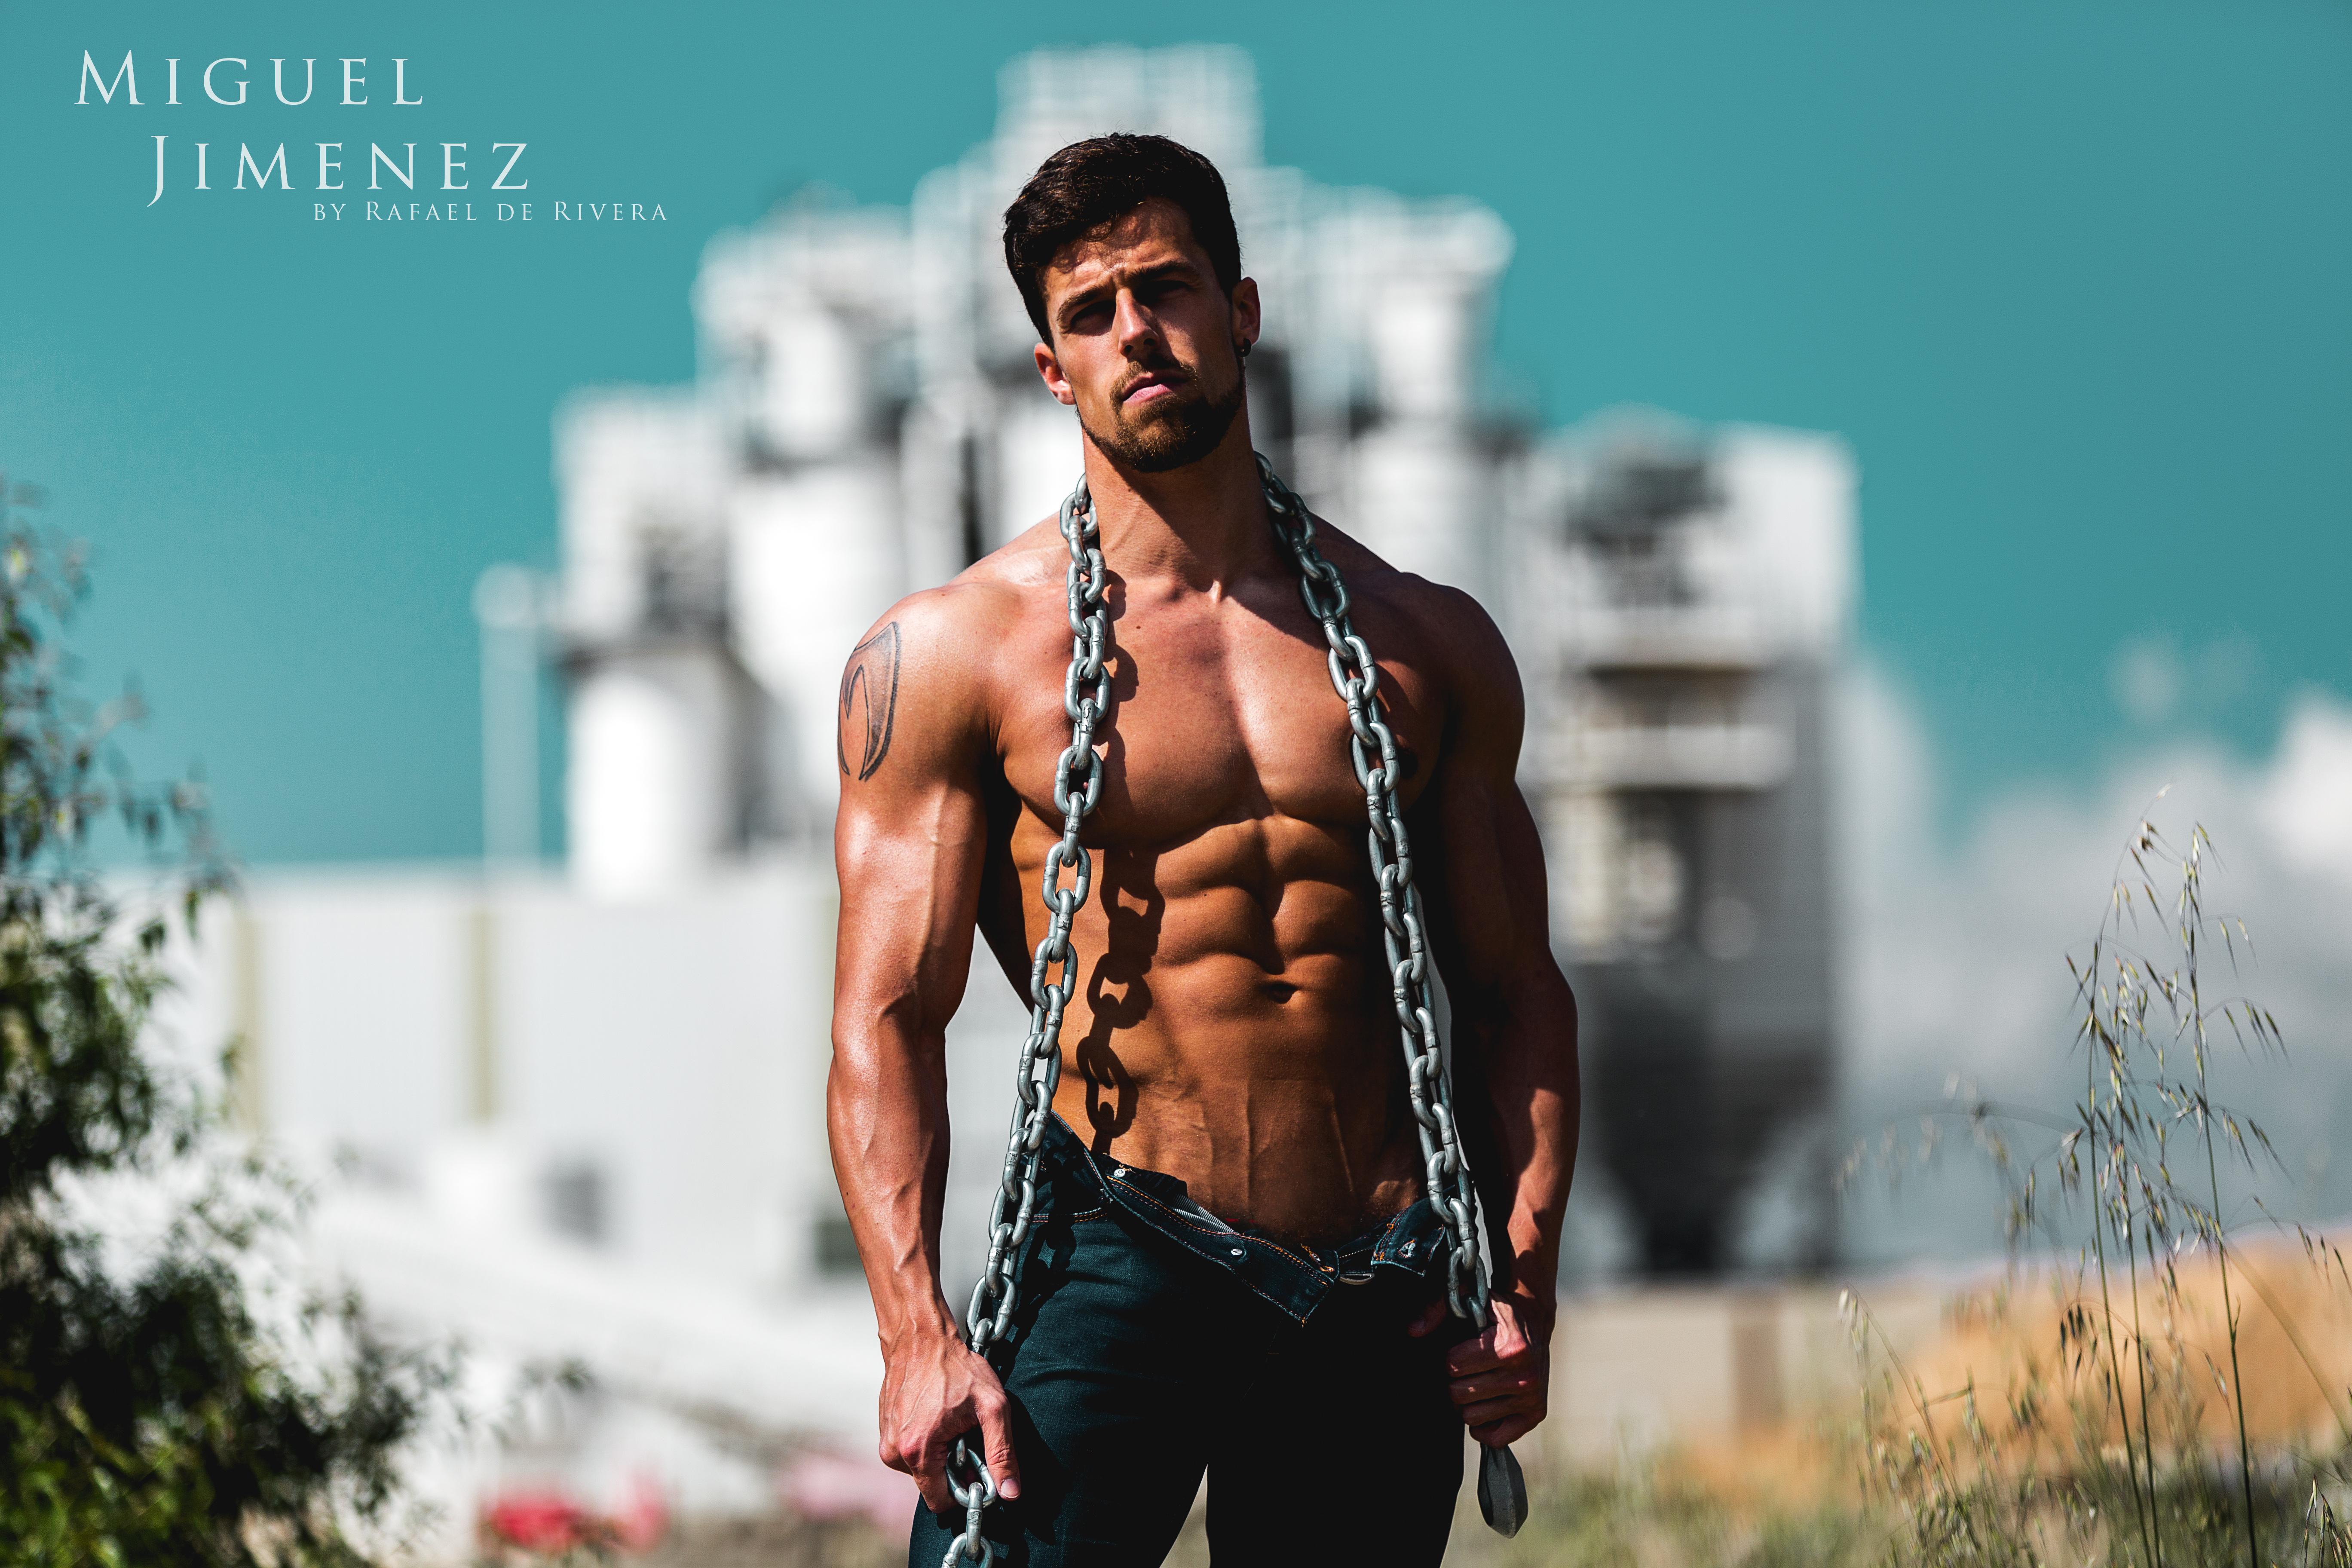 Gurús del gimnasio en Instagram, parte III: Miguel Jiménez